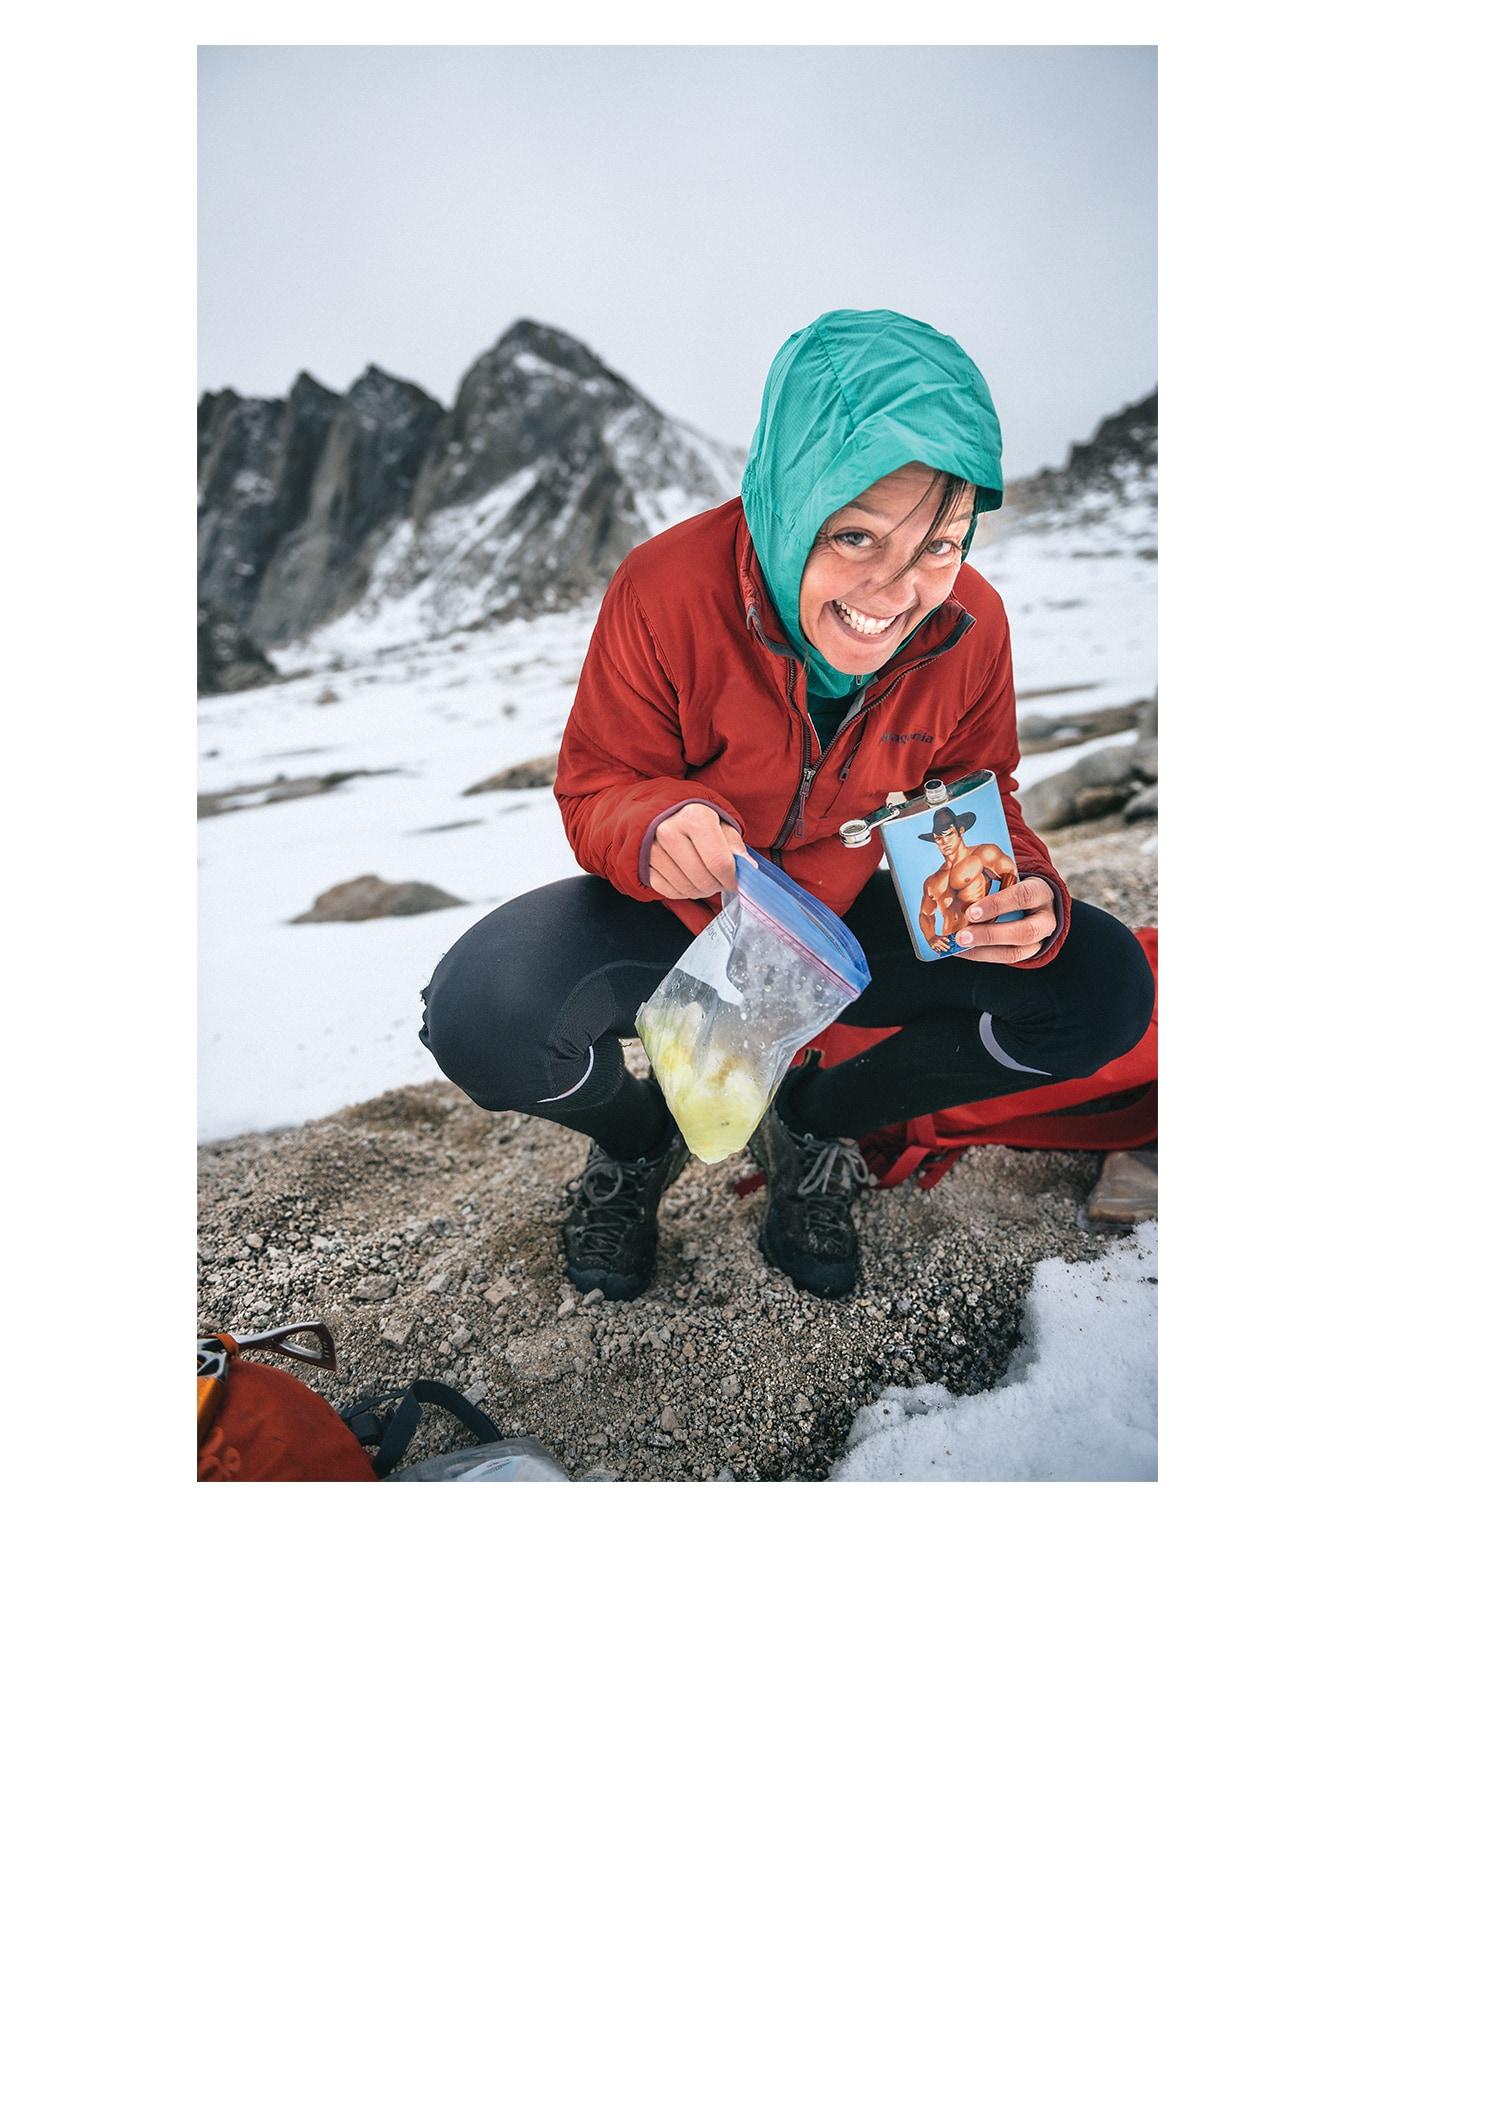 Denied her original objective by poor conditions, Jenn Shelton reroutes and shakes up a glacierita.      Sierra Nevada, California. KEN ETZEL